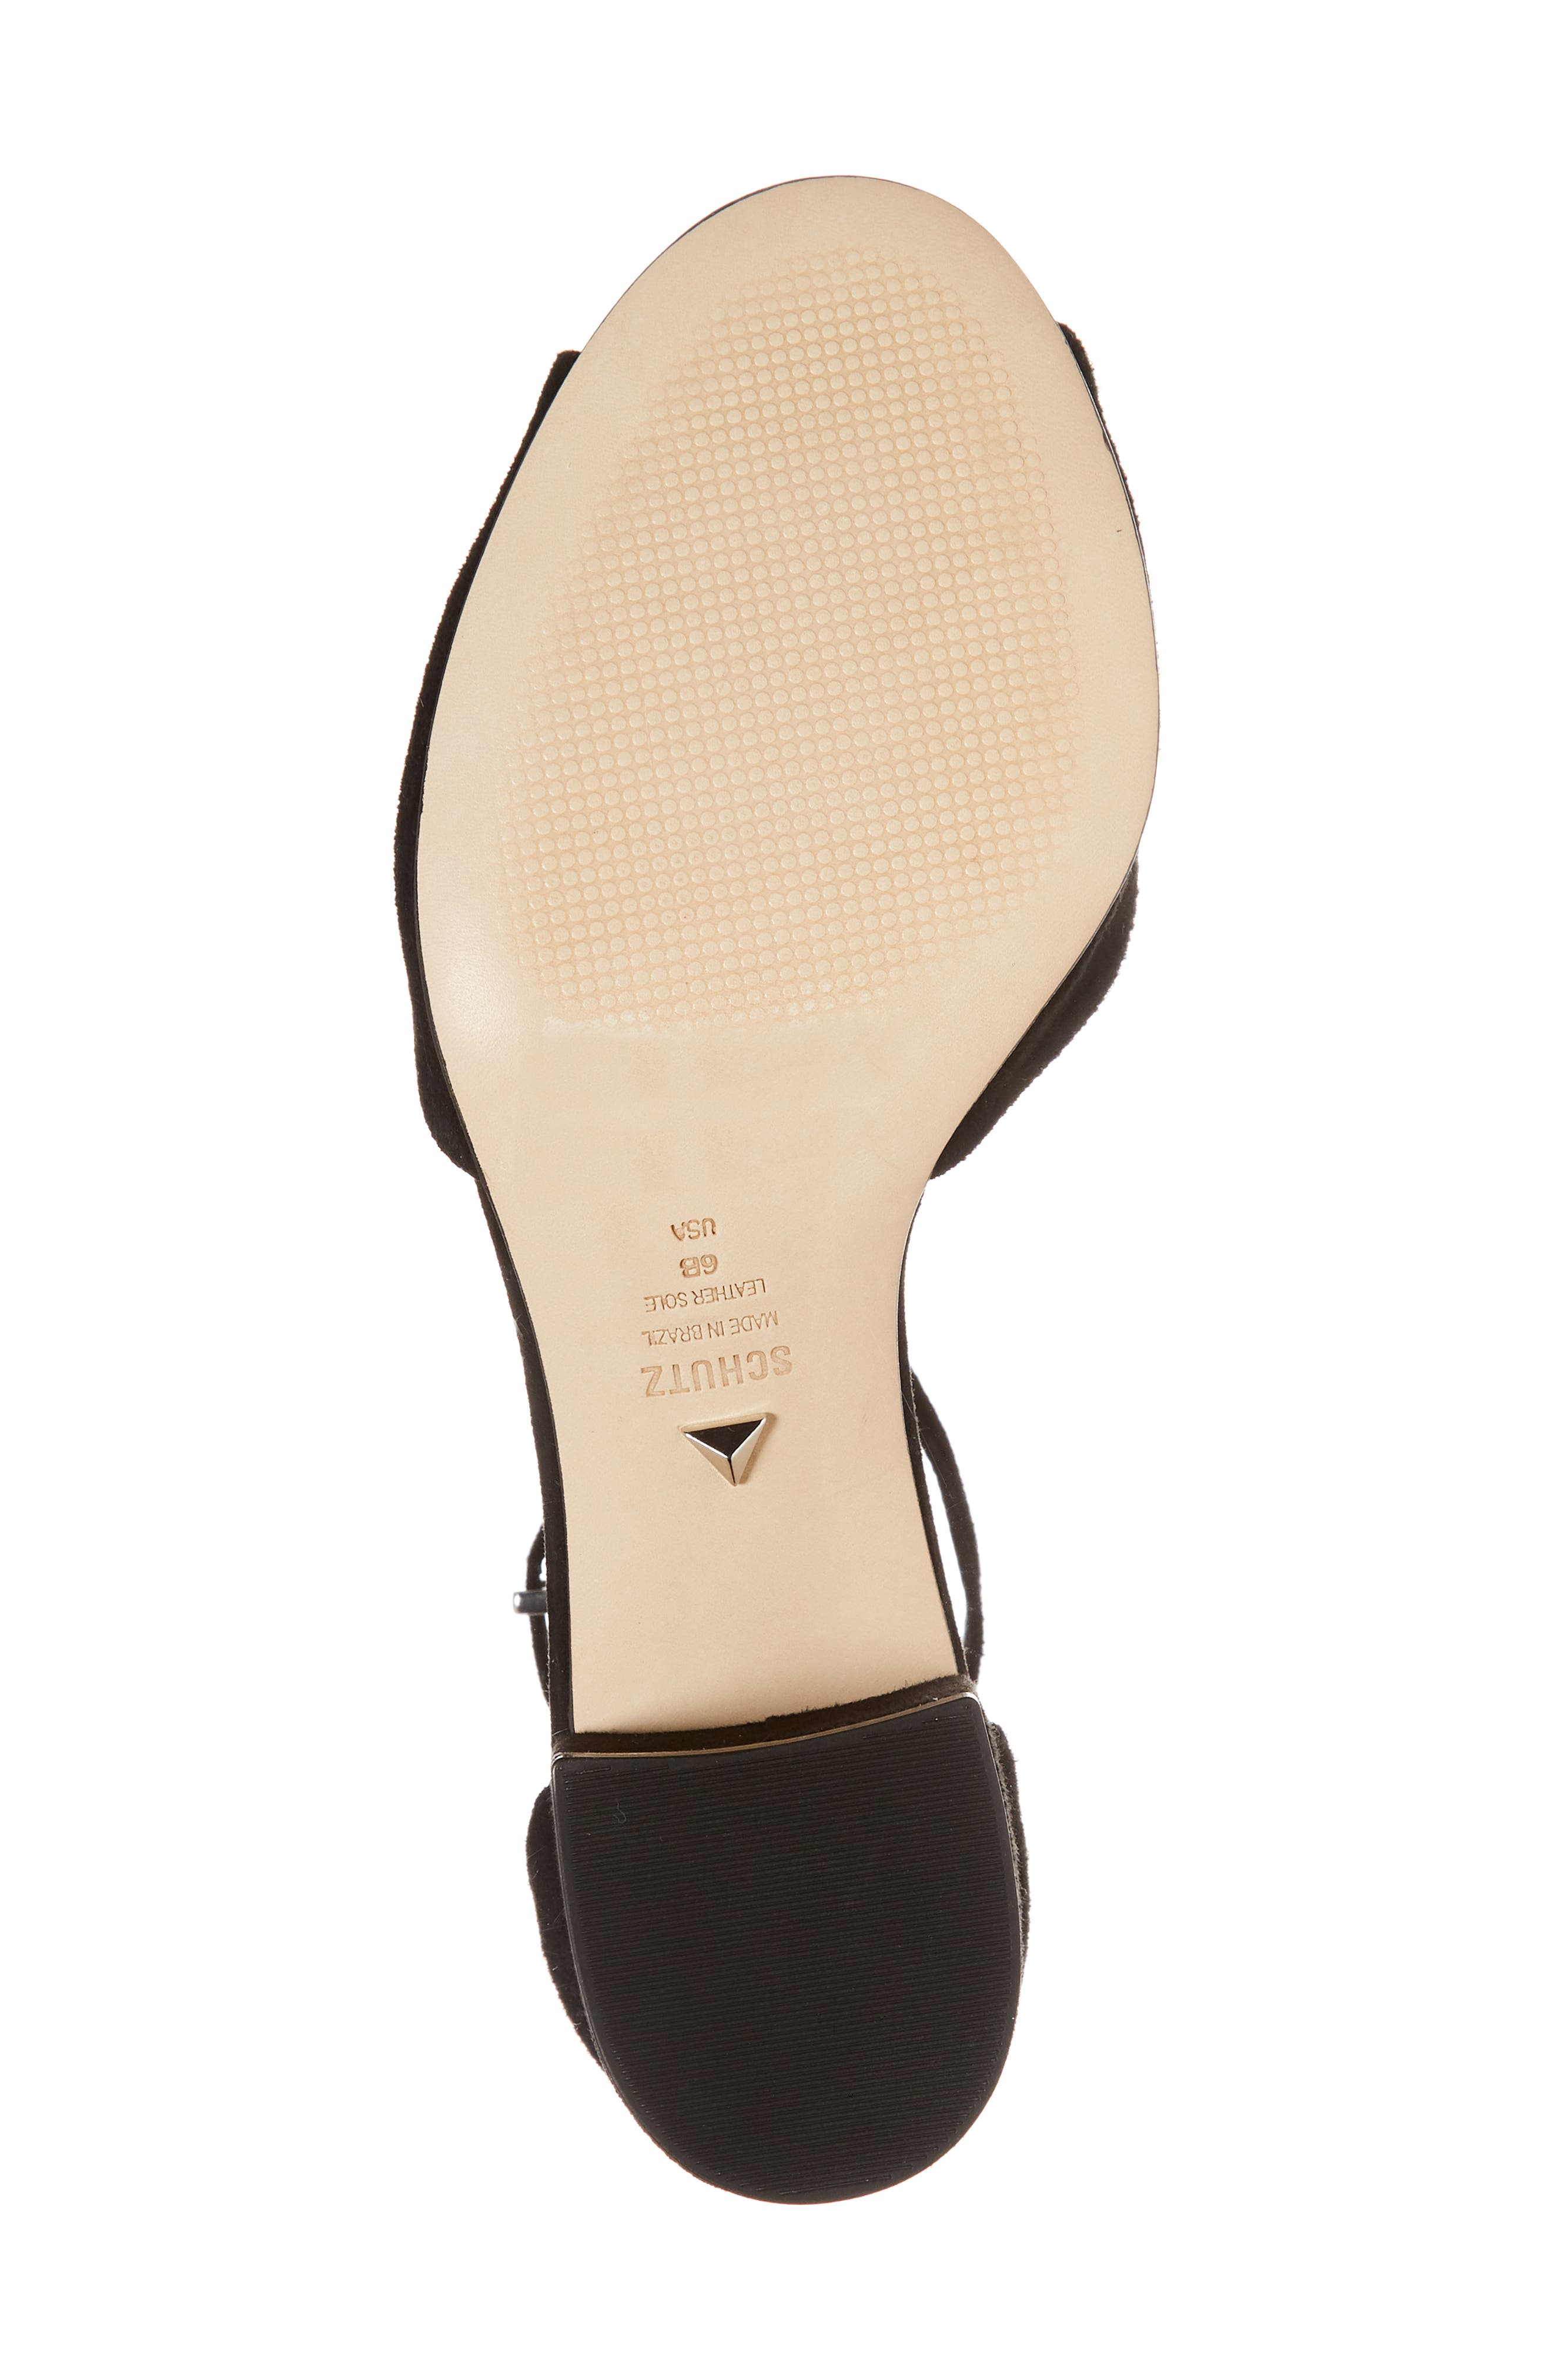 Roama Block Heel Sandal,                             Alternate thumbnail 6, color,                             Black Suede